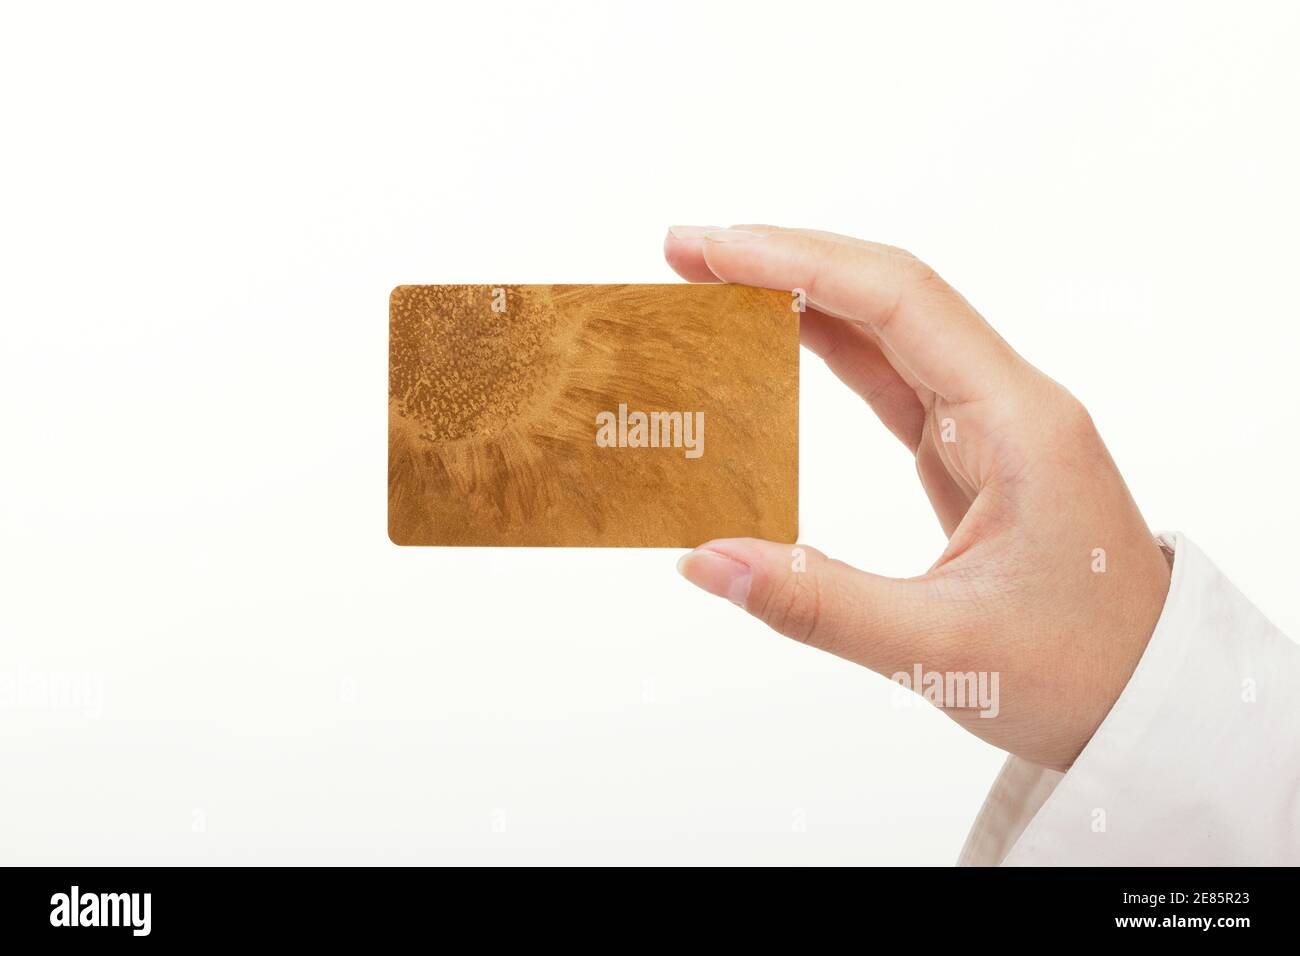 Hand halten Bankkarte hohe Qualität Foto Stockfoto